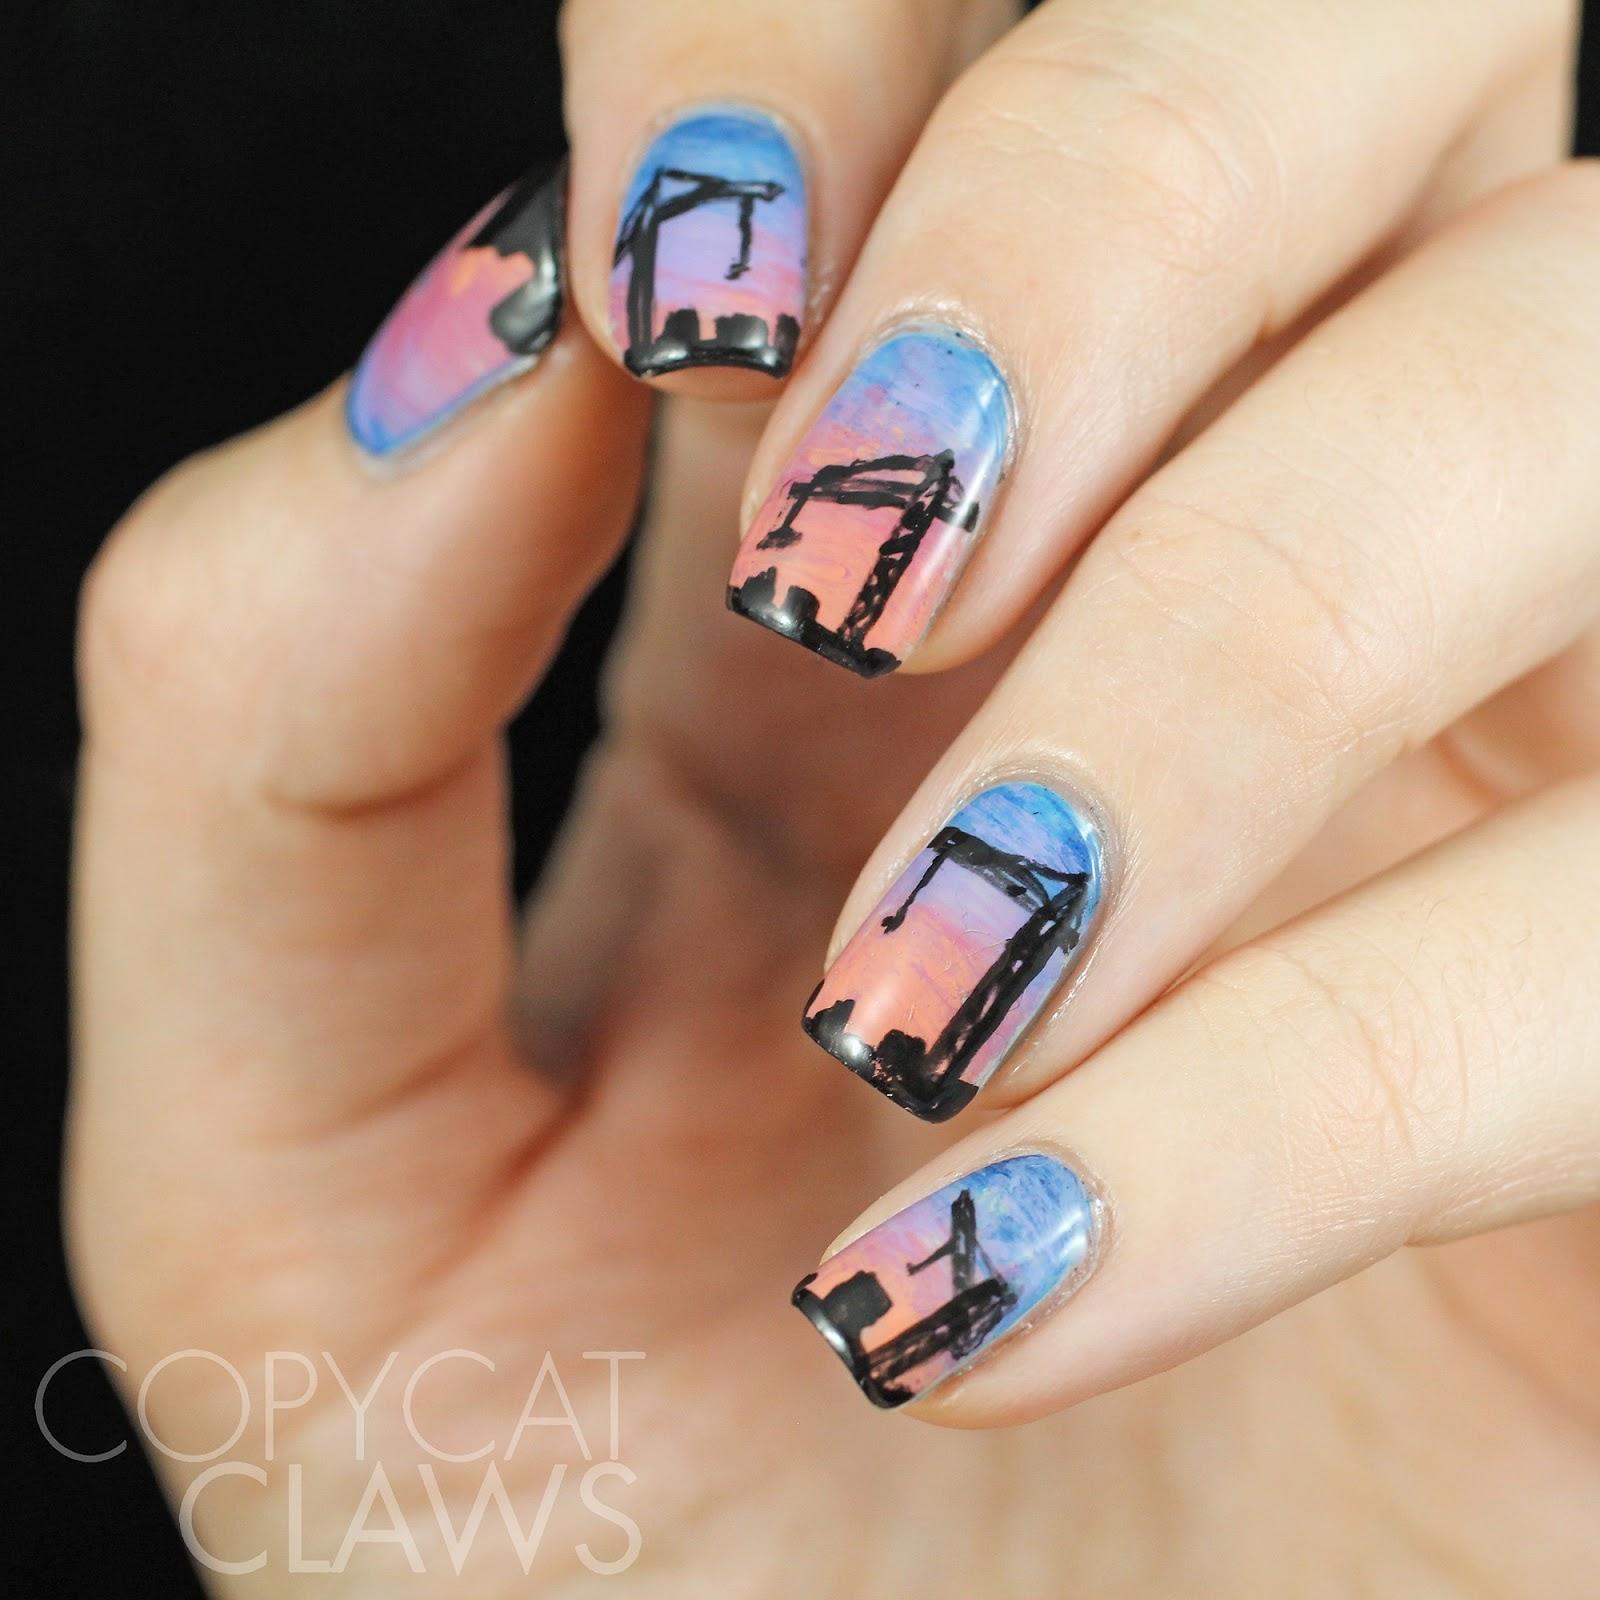 Q Riouser Q Riouser Nail Art: Copycat Claws: Construction Crane Nail Art